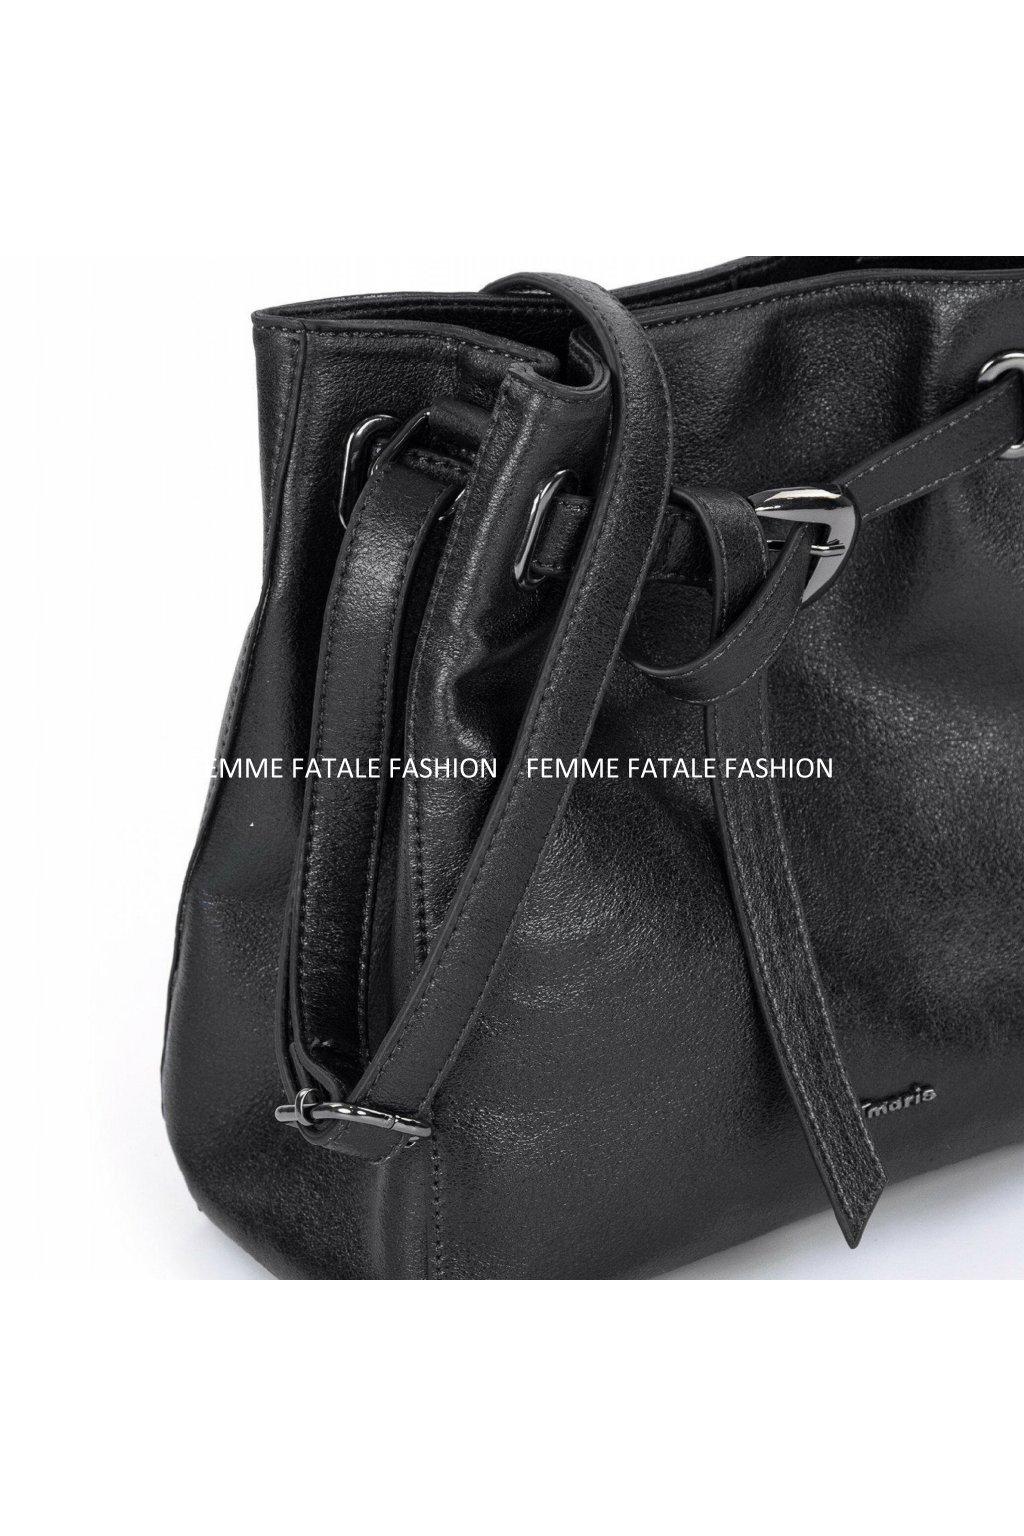 Dámská kabelka Tamaris Belinda (3)